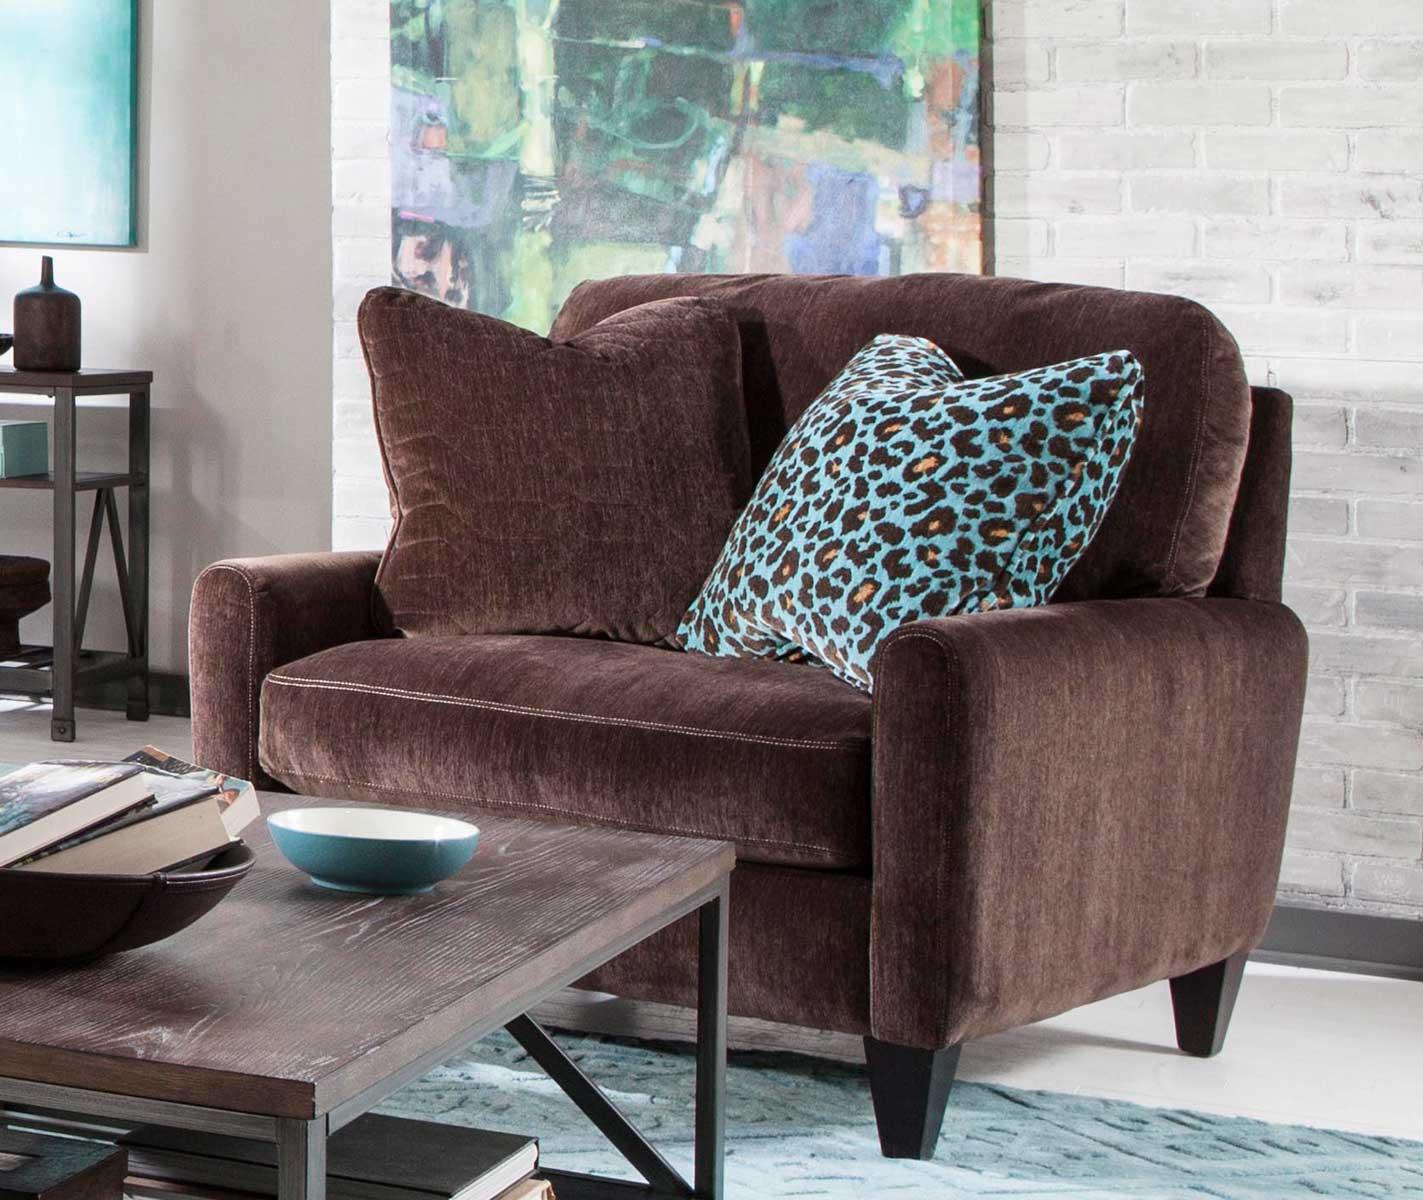 Jackson Mulholland Chair - Chocolate